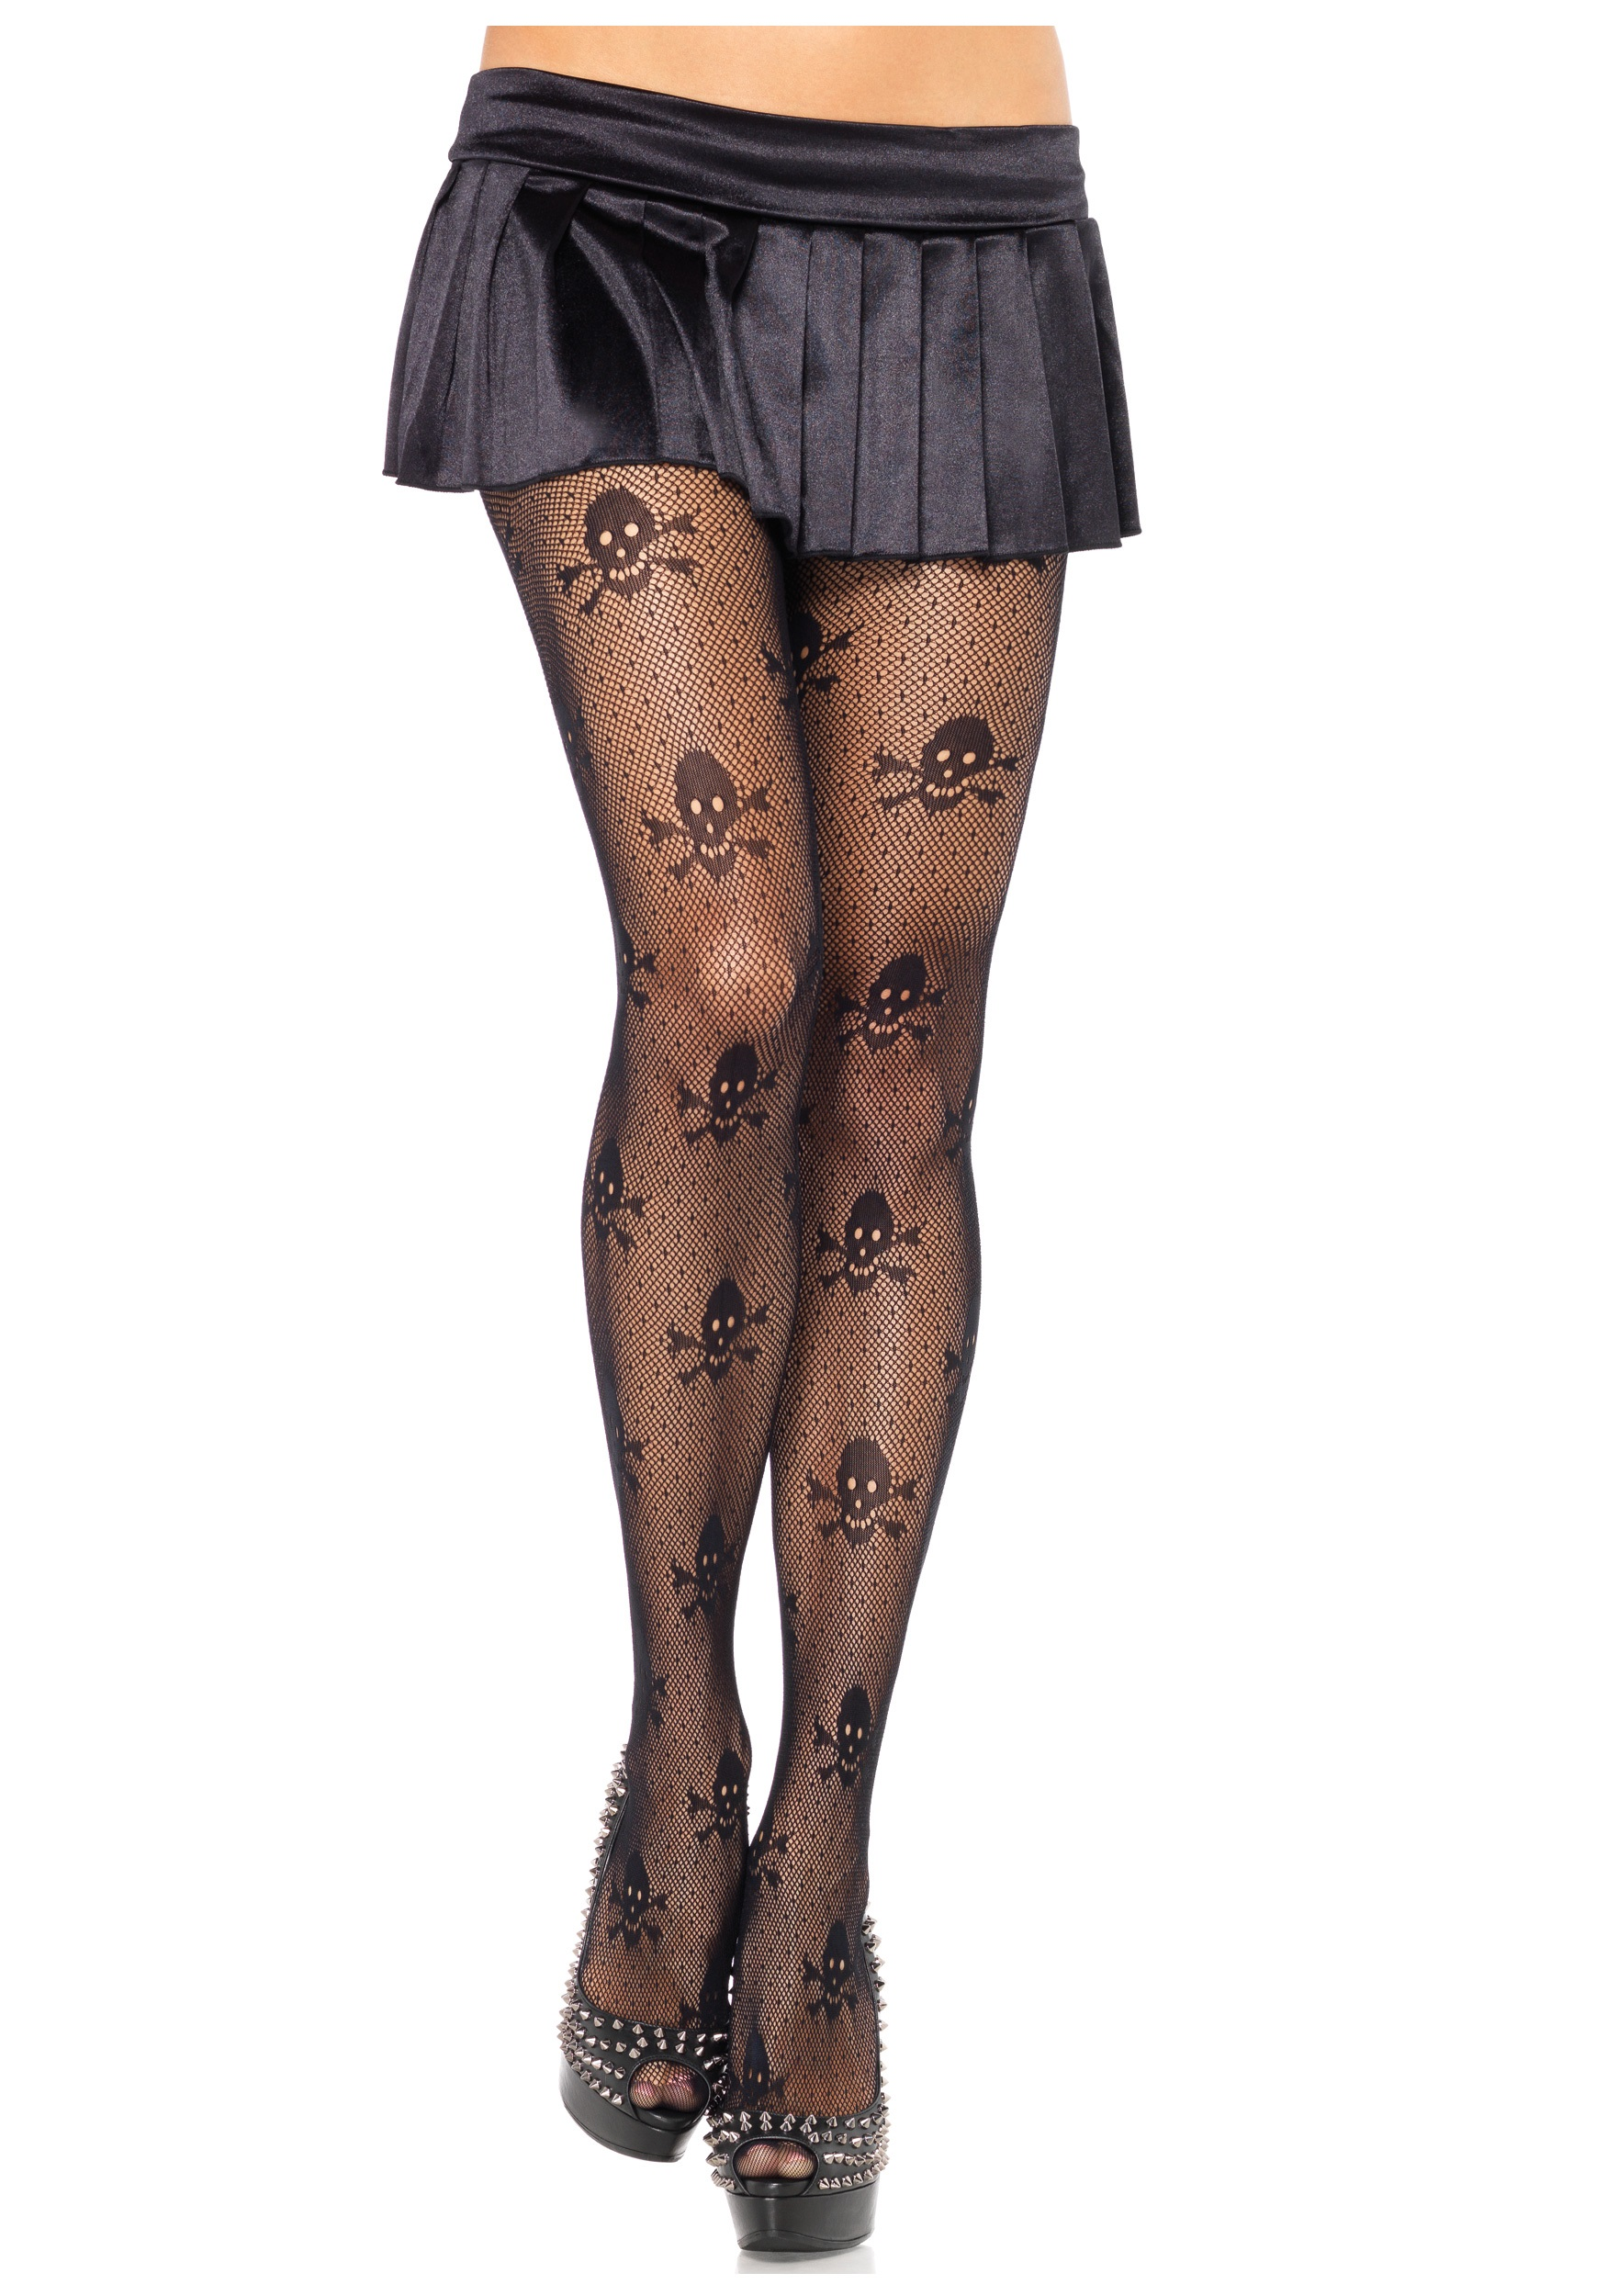 Black Women/'s Lady Mesh Stockings Pantyhoses Tights Skeleton Printed Stockings